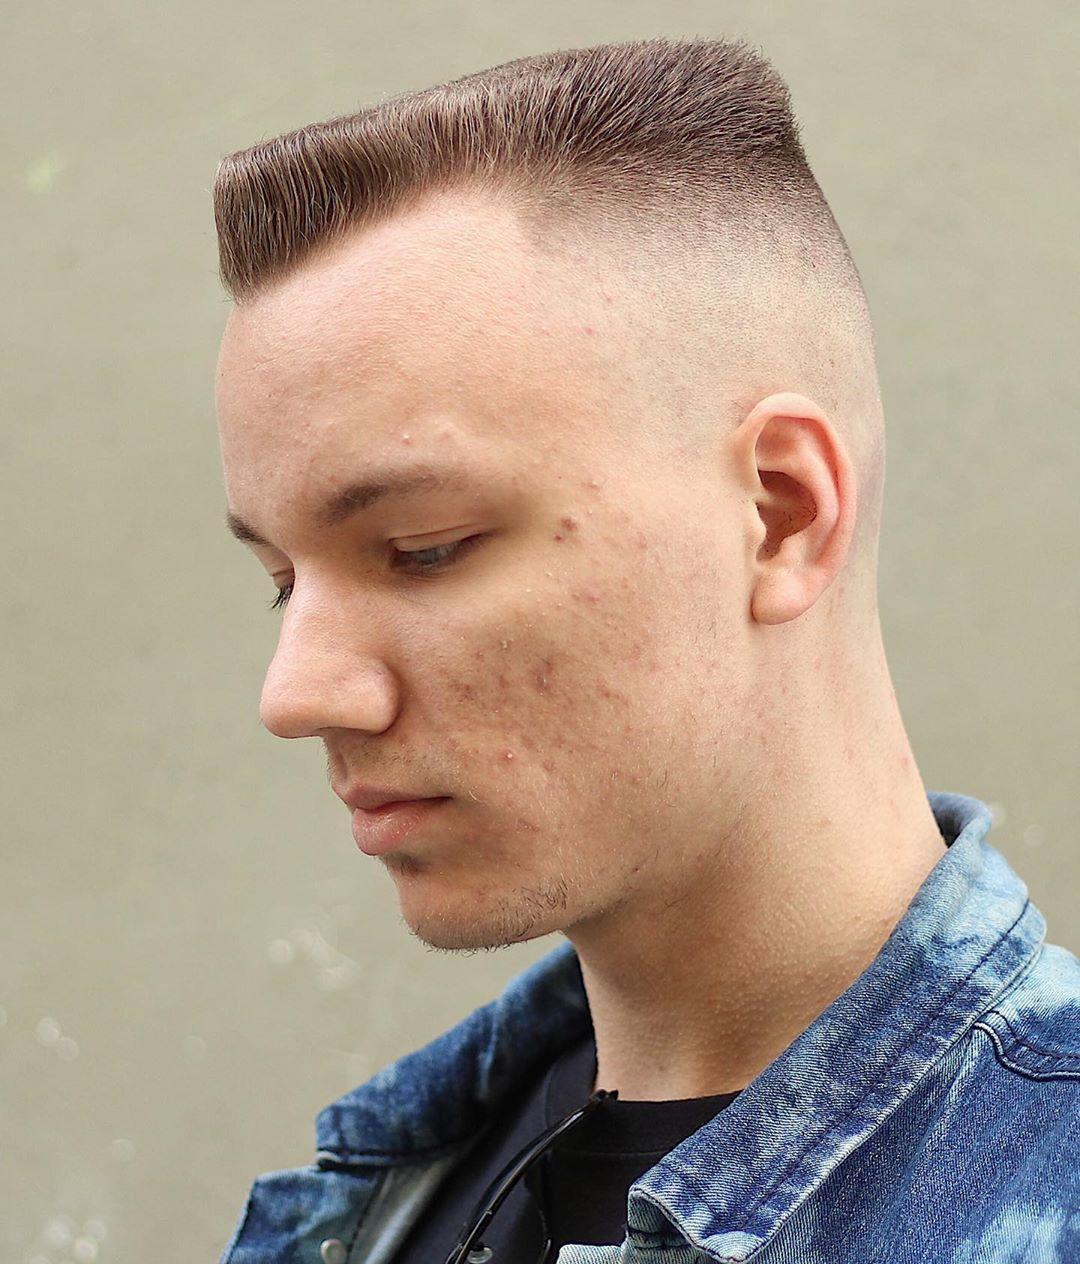 braboshandbarbershop #barber #barberlife #fade #faded